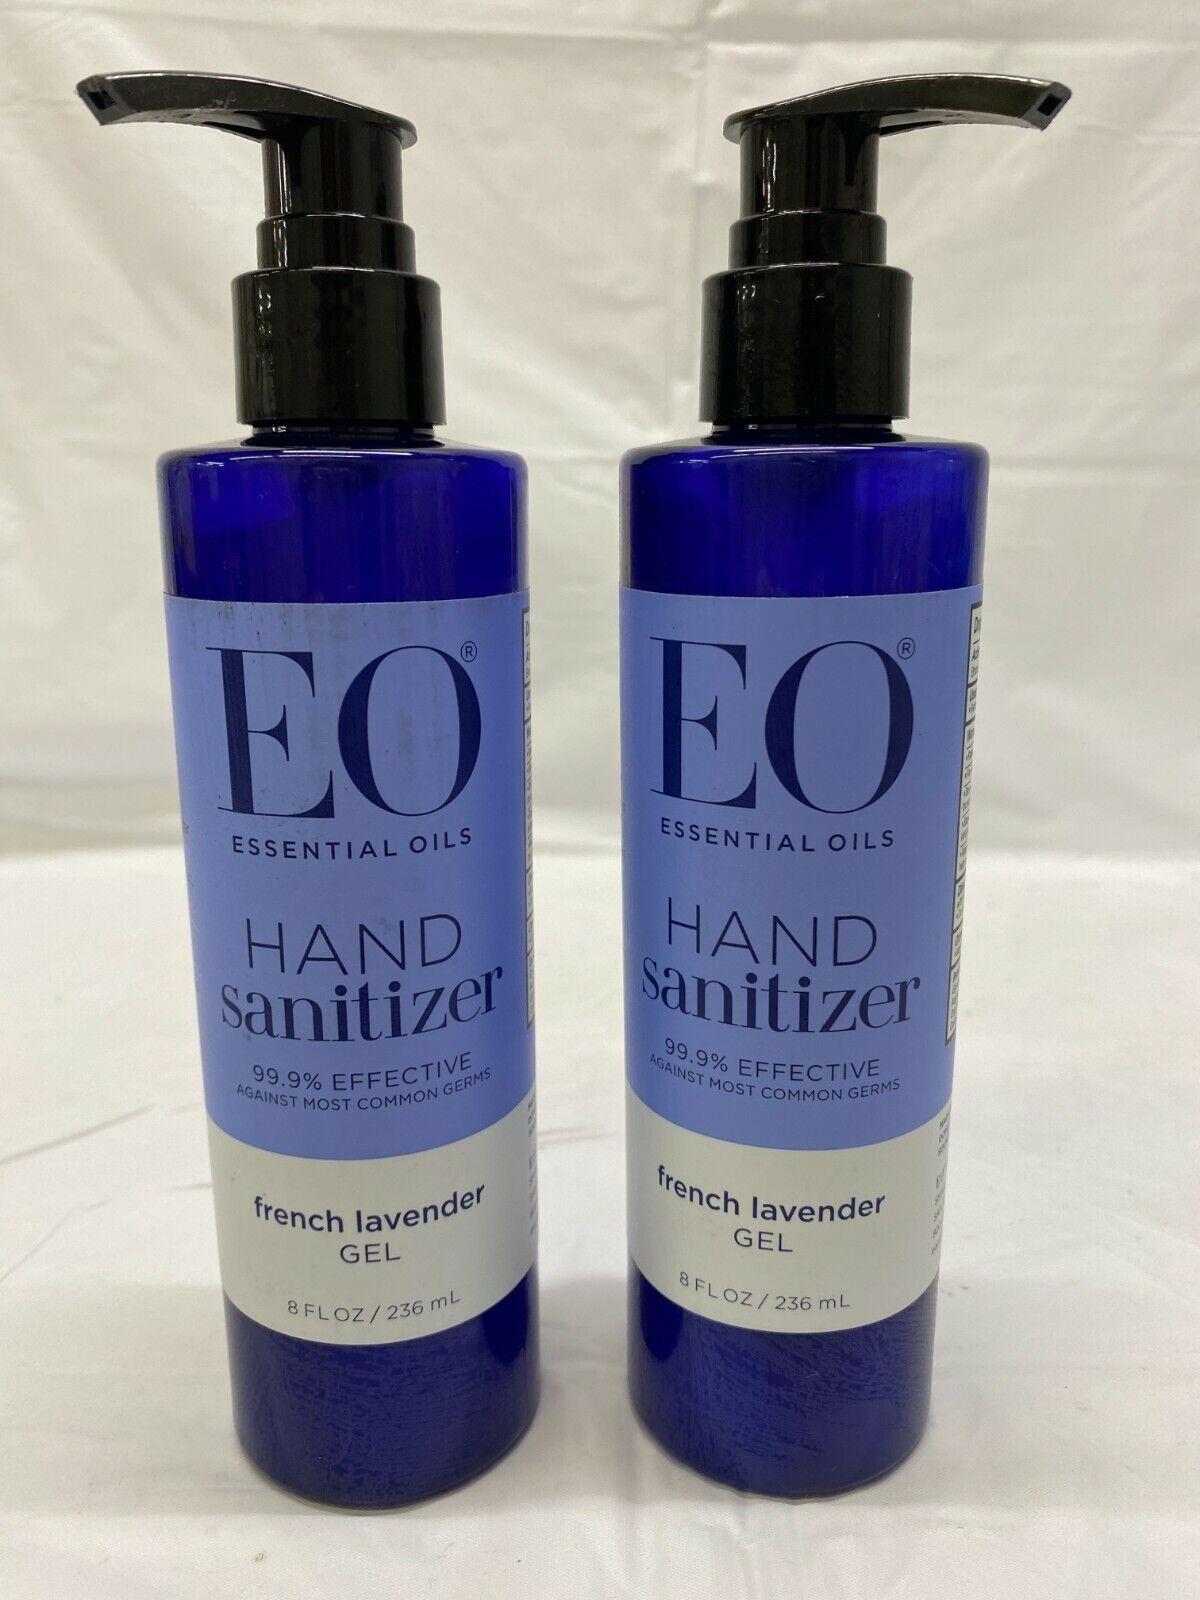 Eo Products Hand Sanitizing Gel Lavender Essential Oil 8 Fl